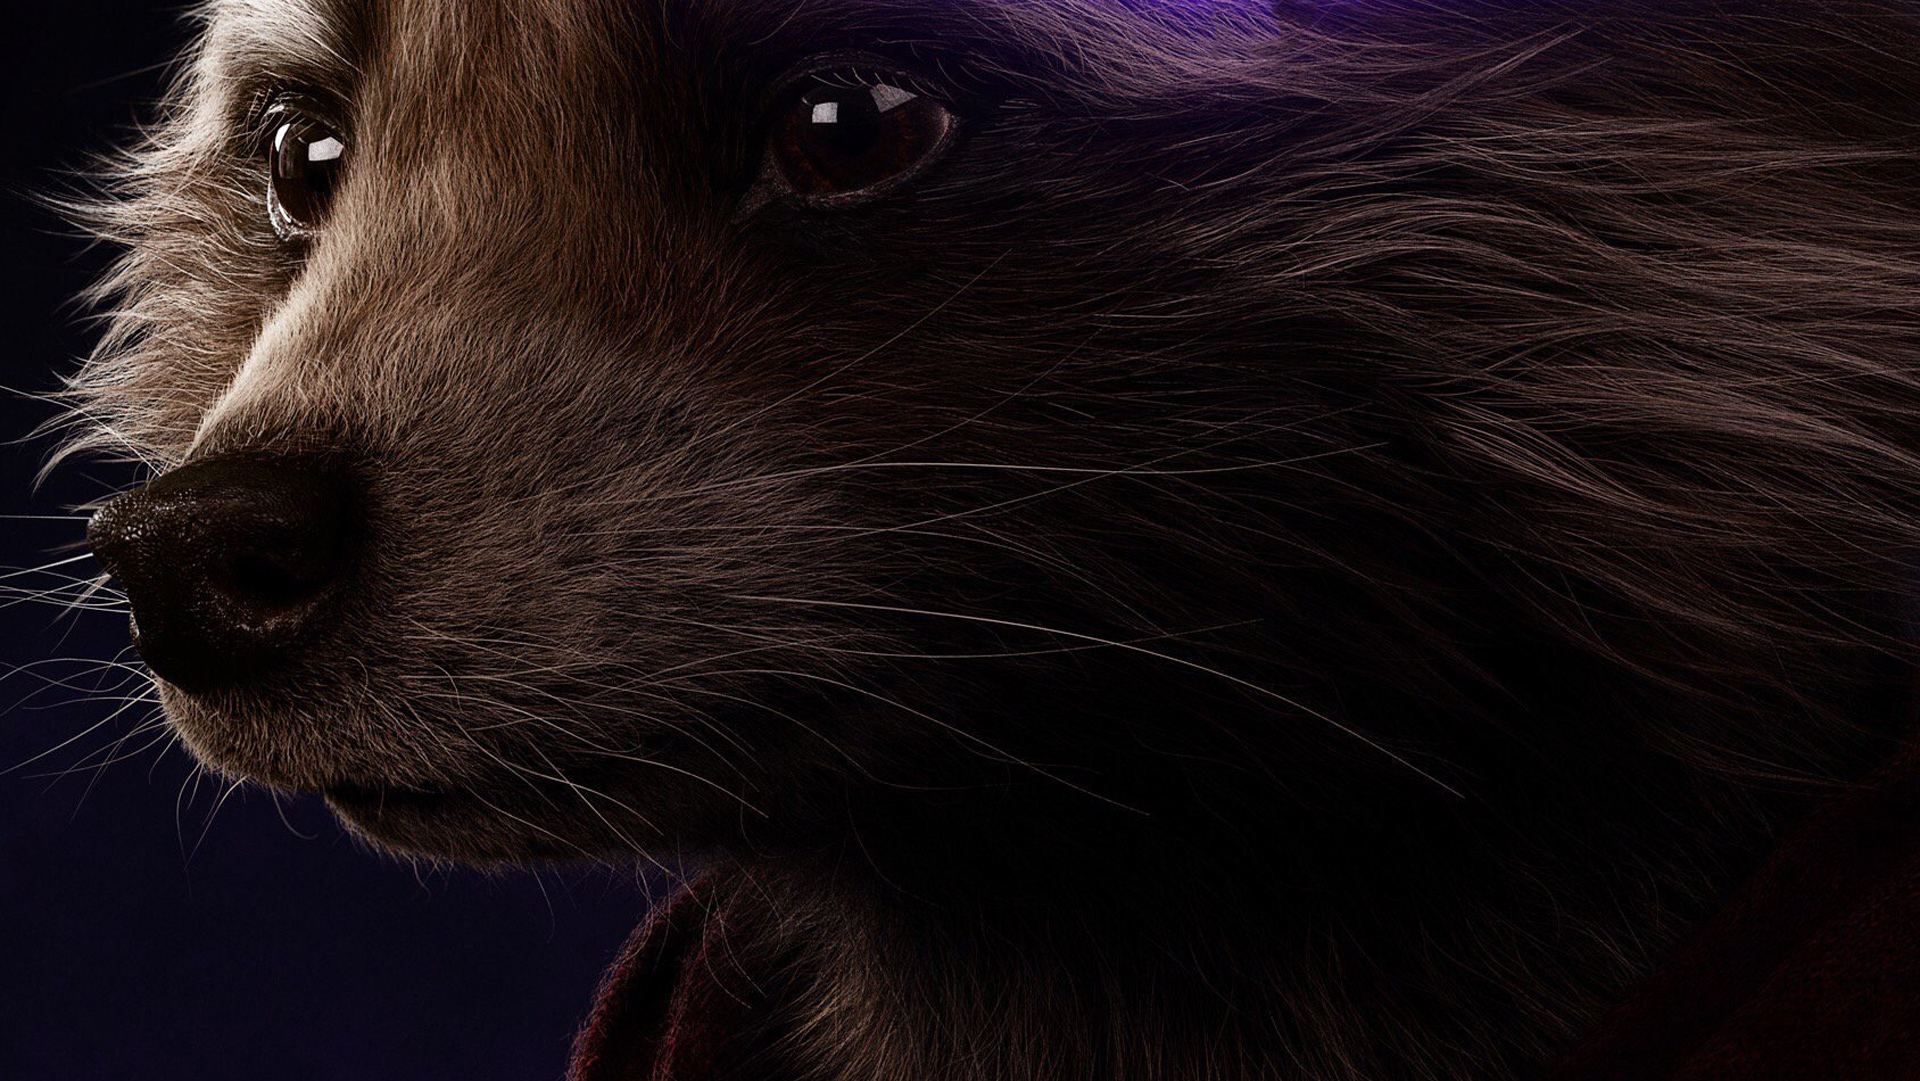 Rocket raccoon avengers endgame 2019 poster hd movies 4k - Rocket raccoon phone wallpaper ...